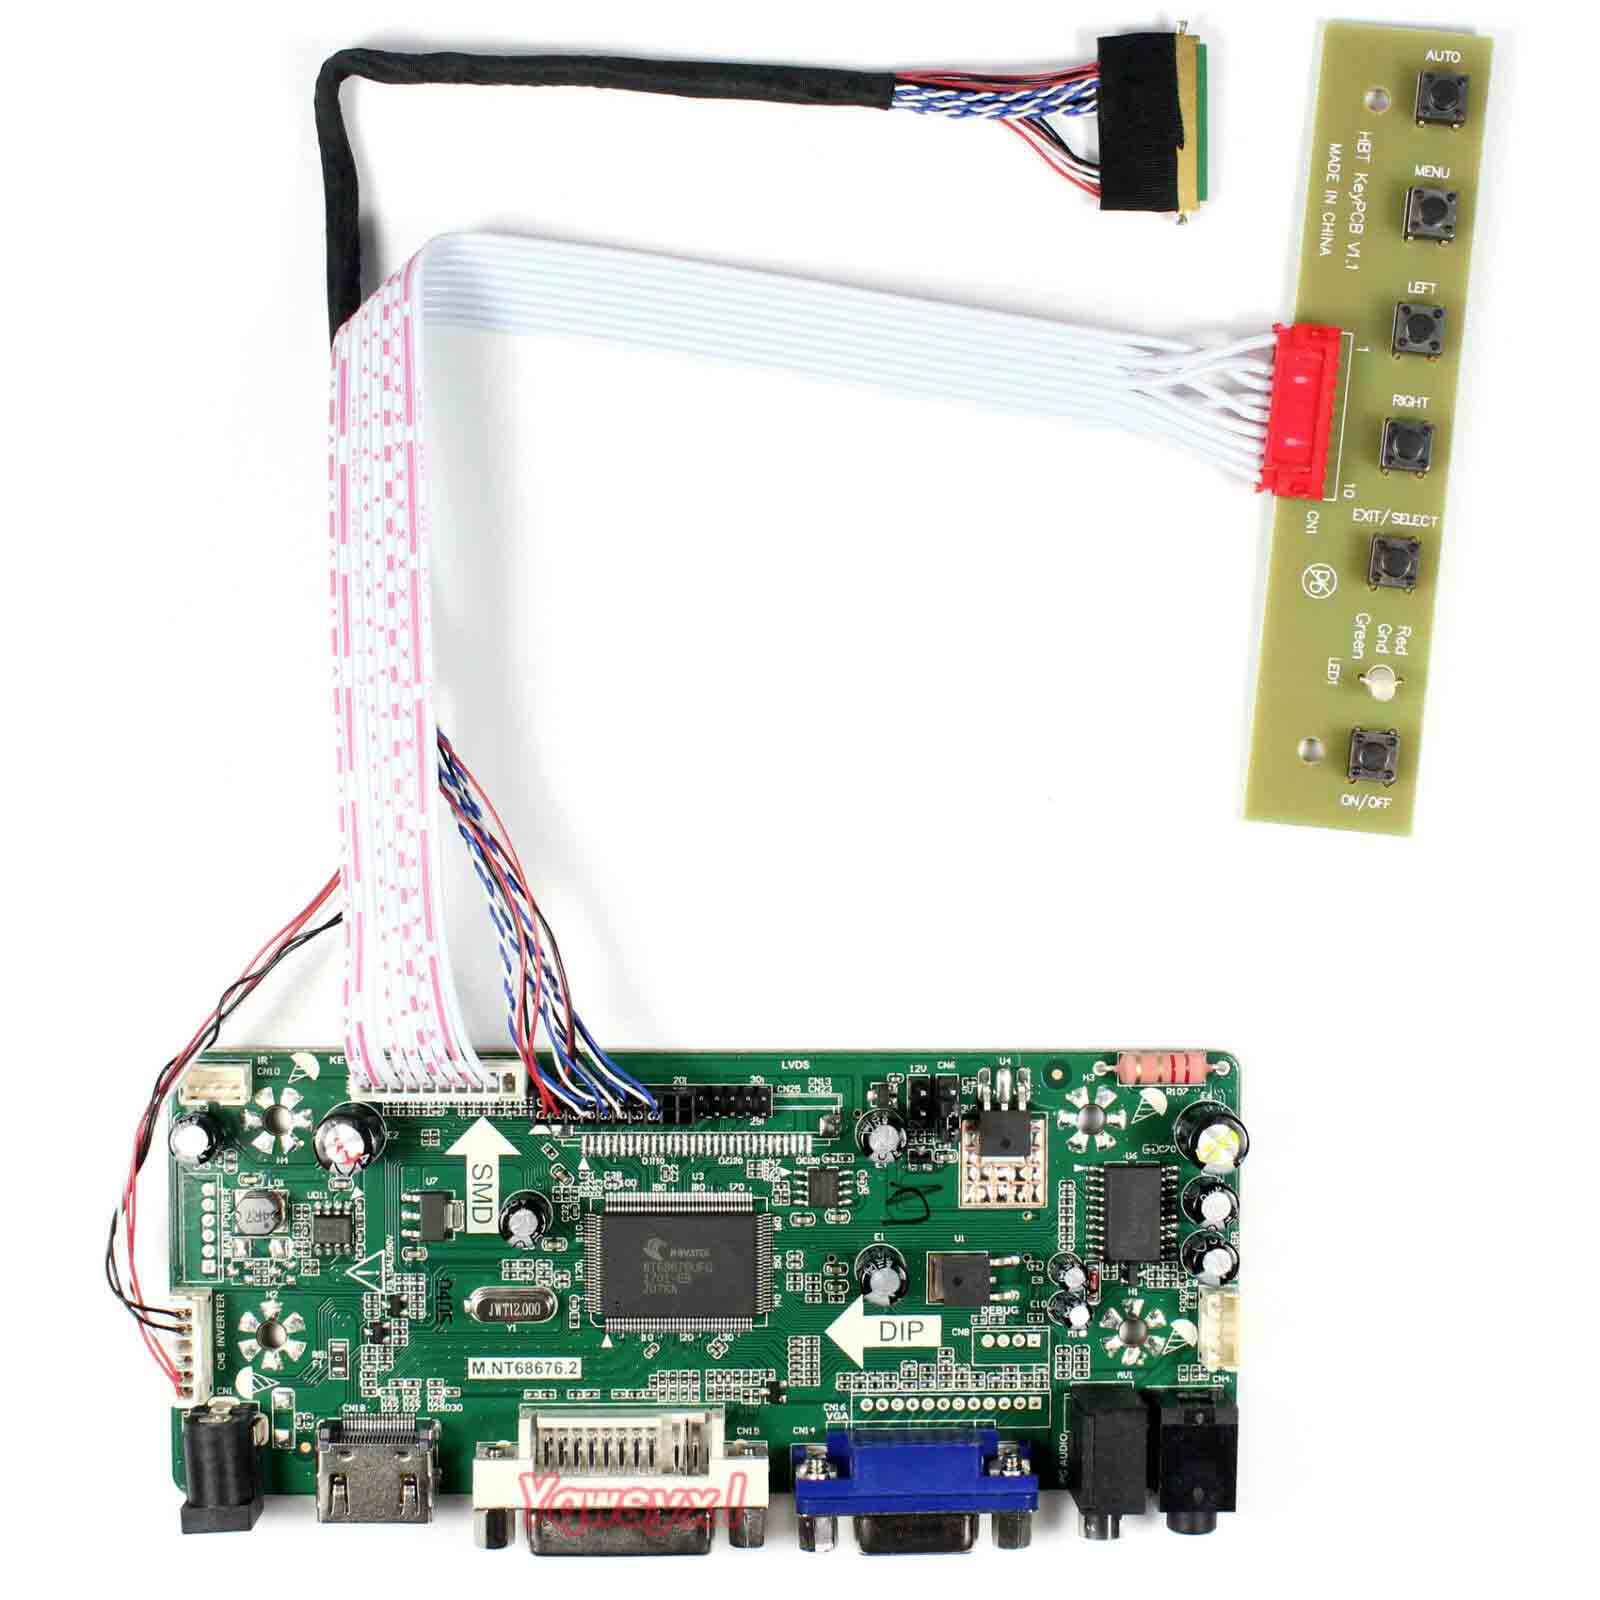 Yqwsyxl Control Board Monitor Kit For LTN101NT06  HDMI+DVI+VGA LCD LED Screen Controller Board Driver